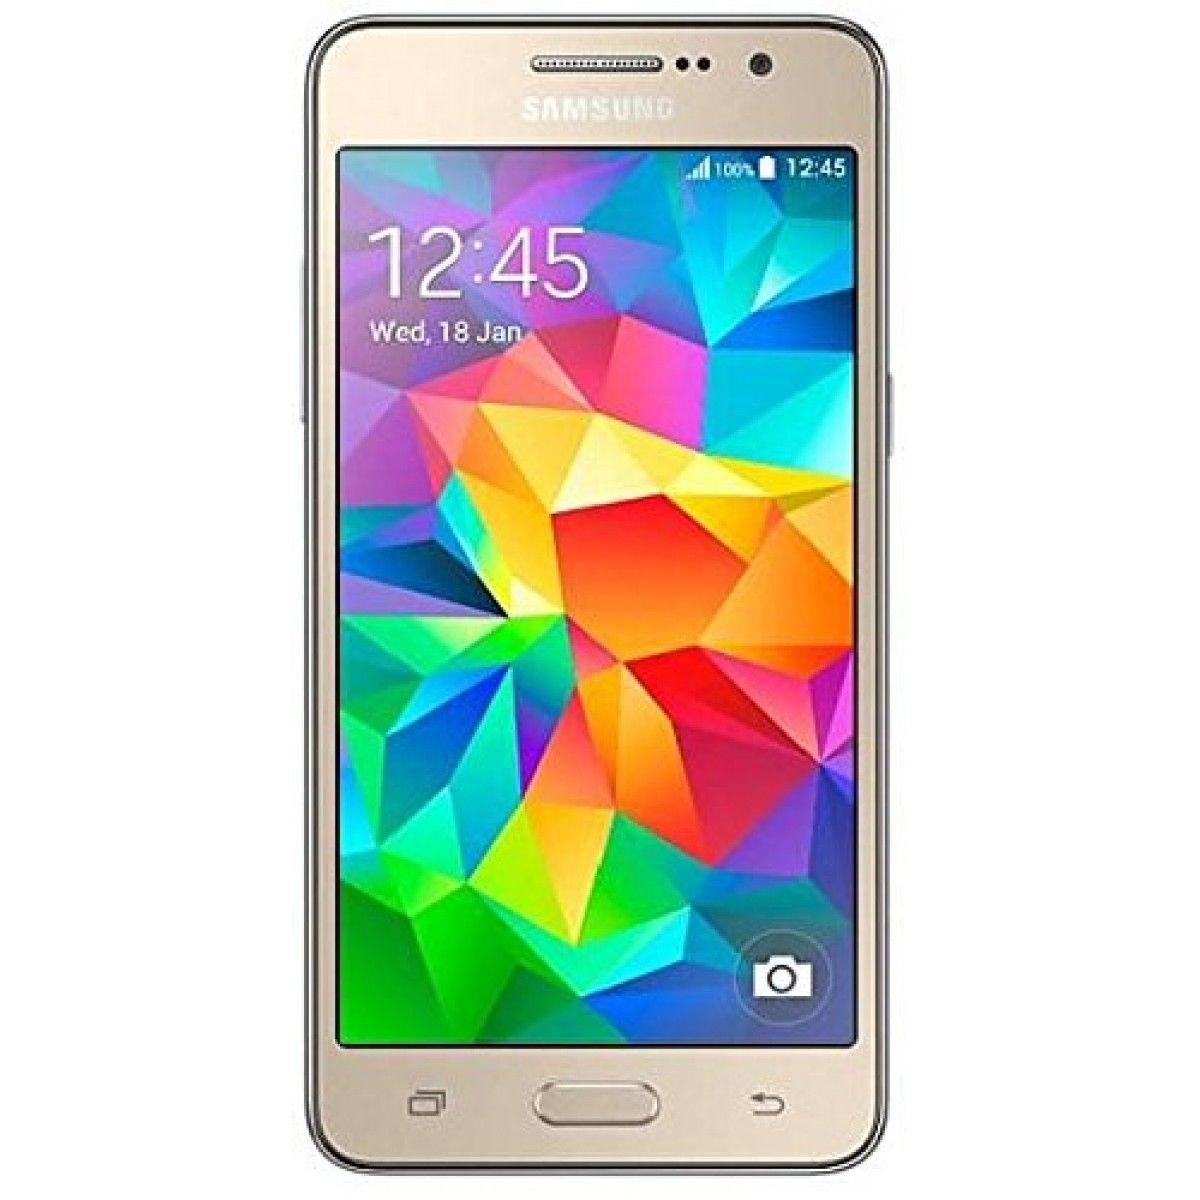 Samsung SM-G531F Galaxy Grand Prime LTE 8GB - златист - 1